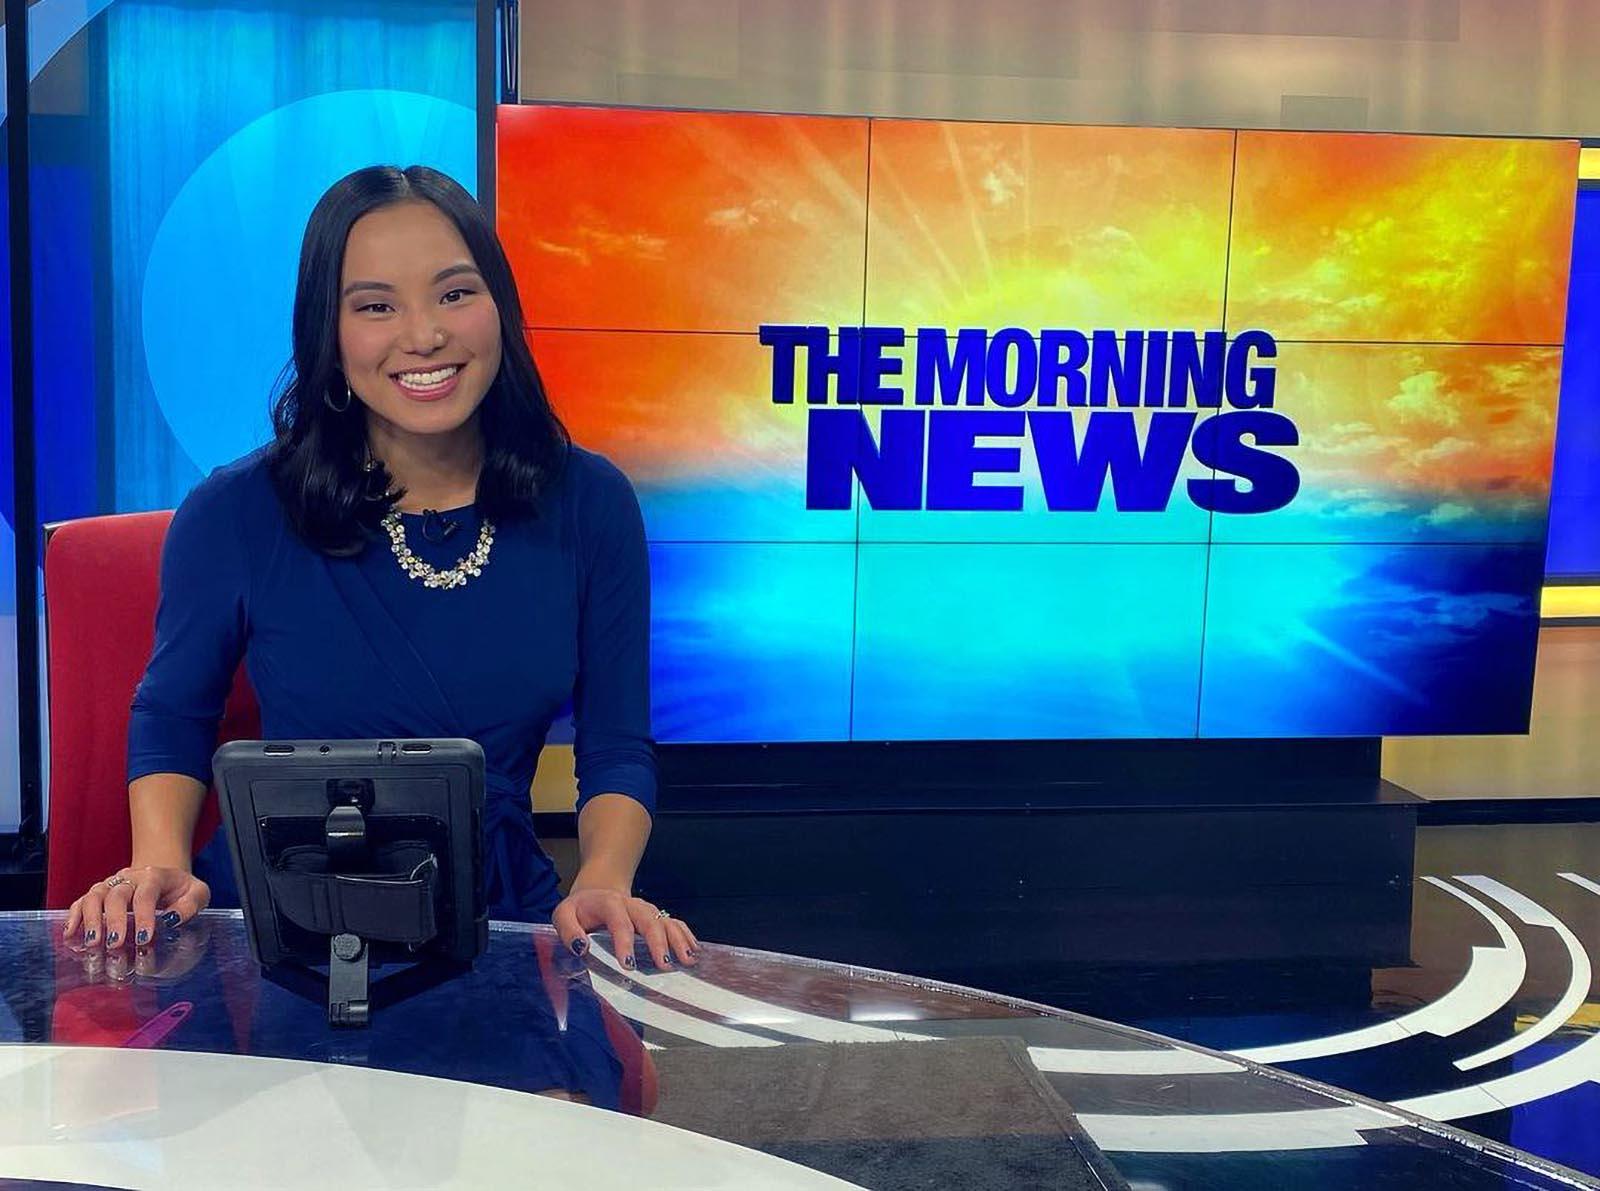 Adrienne Smith briefing morning news on WSYR 9